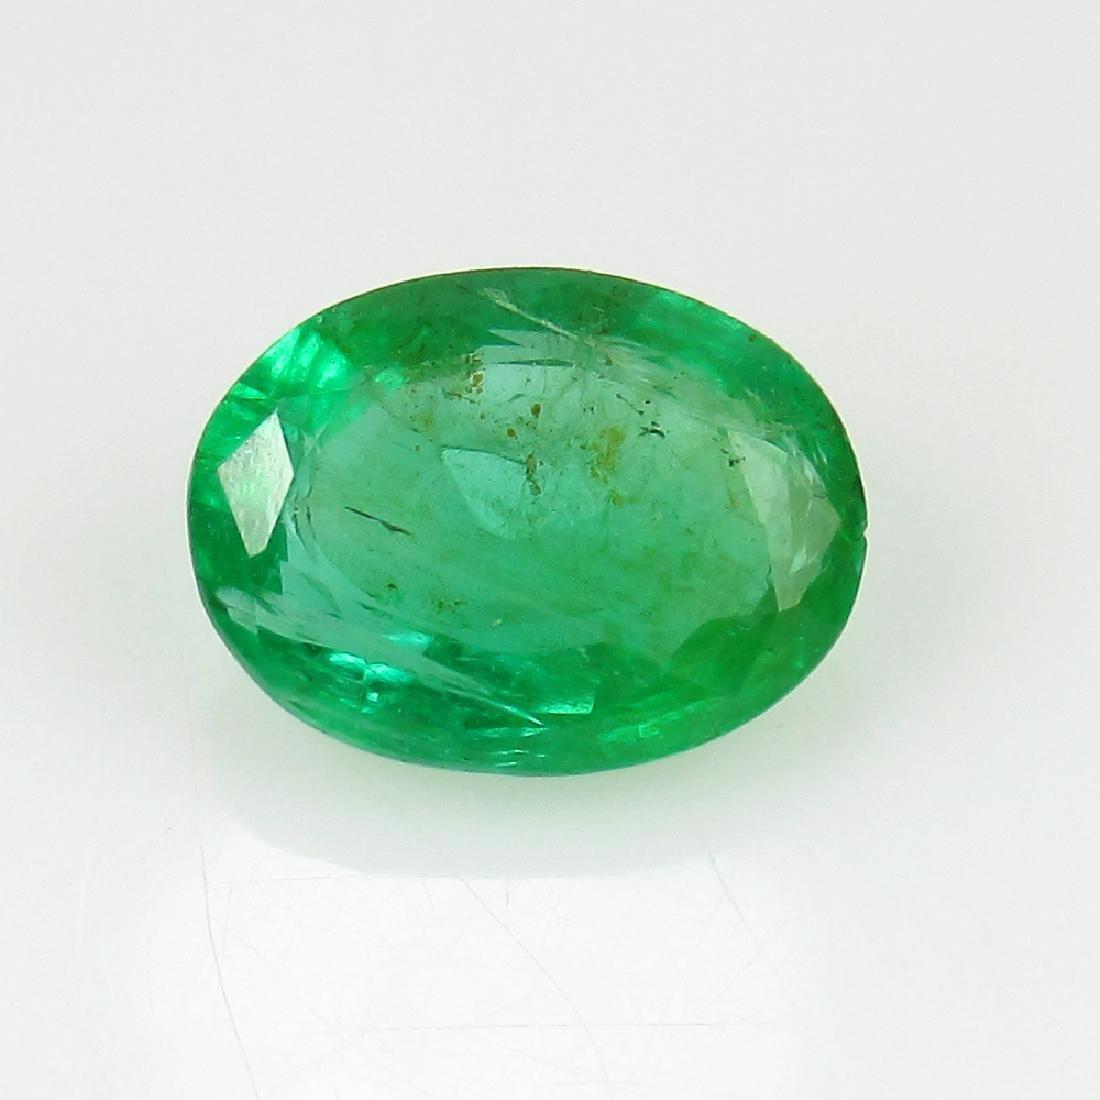 1.89 Ct IGI Certified Genuine Zambian Emerald Nice Oval